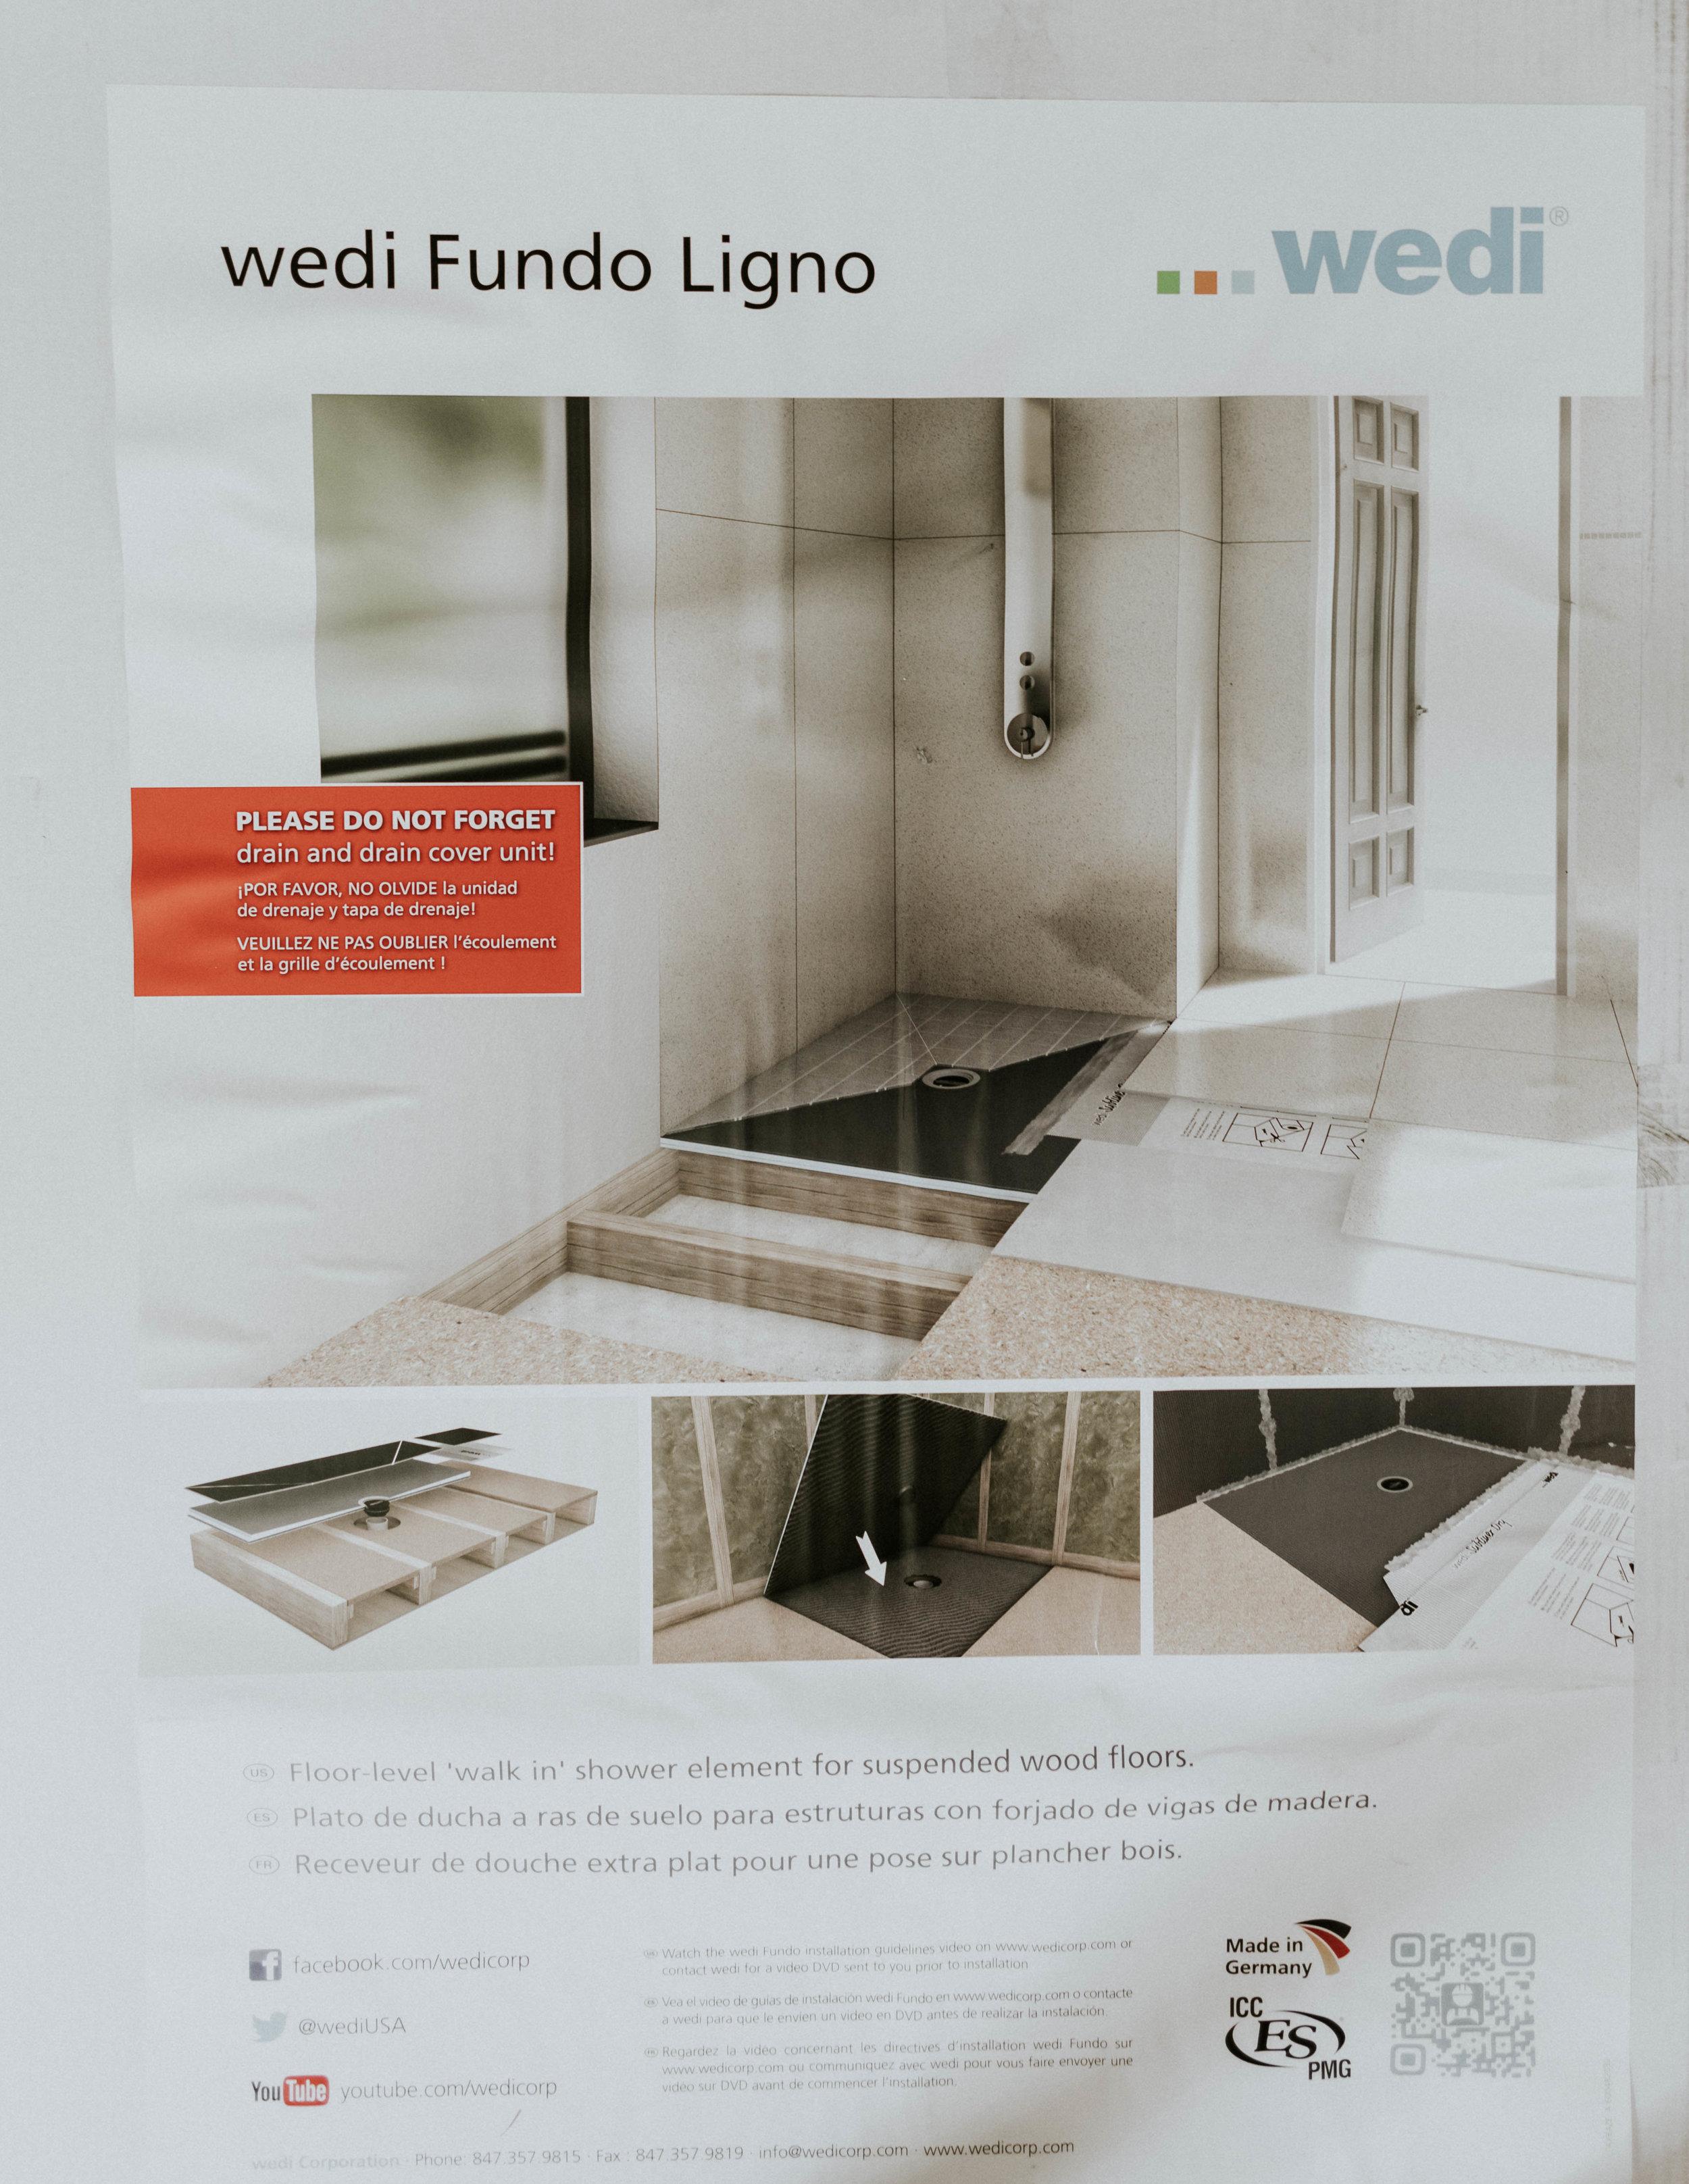 WEDI FUNDO LIGNO (1 of 1).jpg